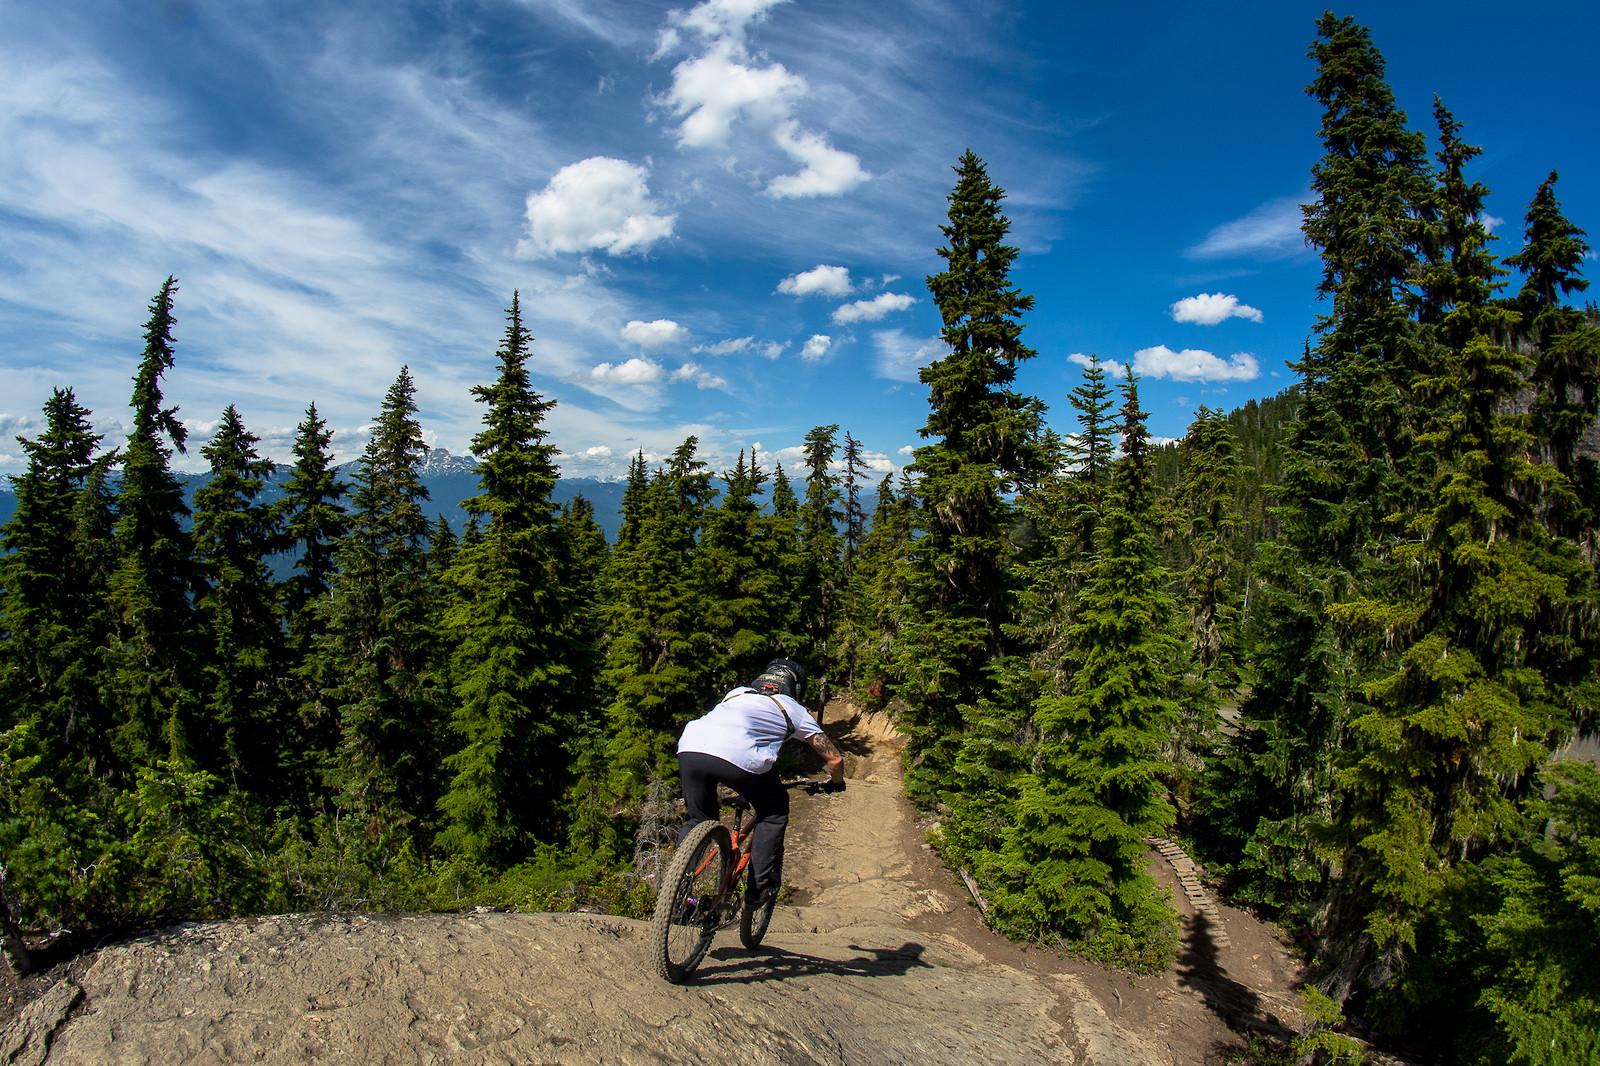 Original Sin - Whistler Mountain Bike Park on Hardtail - Banan - Mountain Biking Pictures - Vital MTB